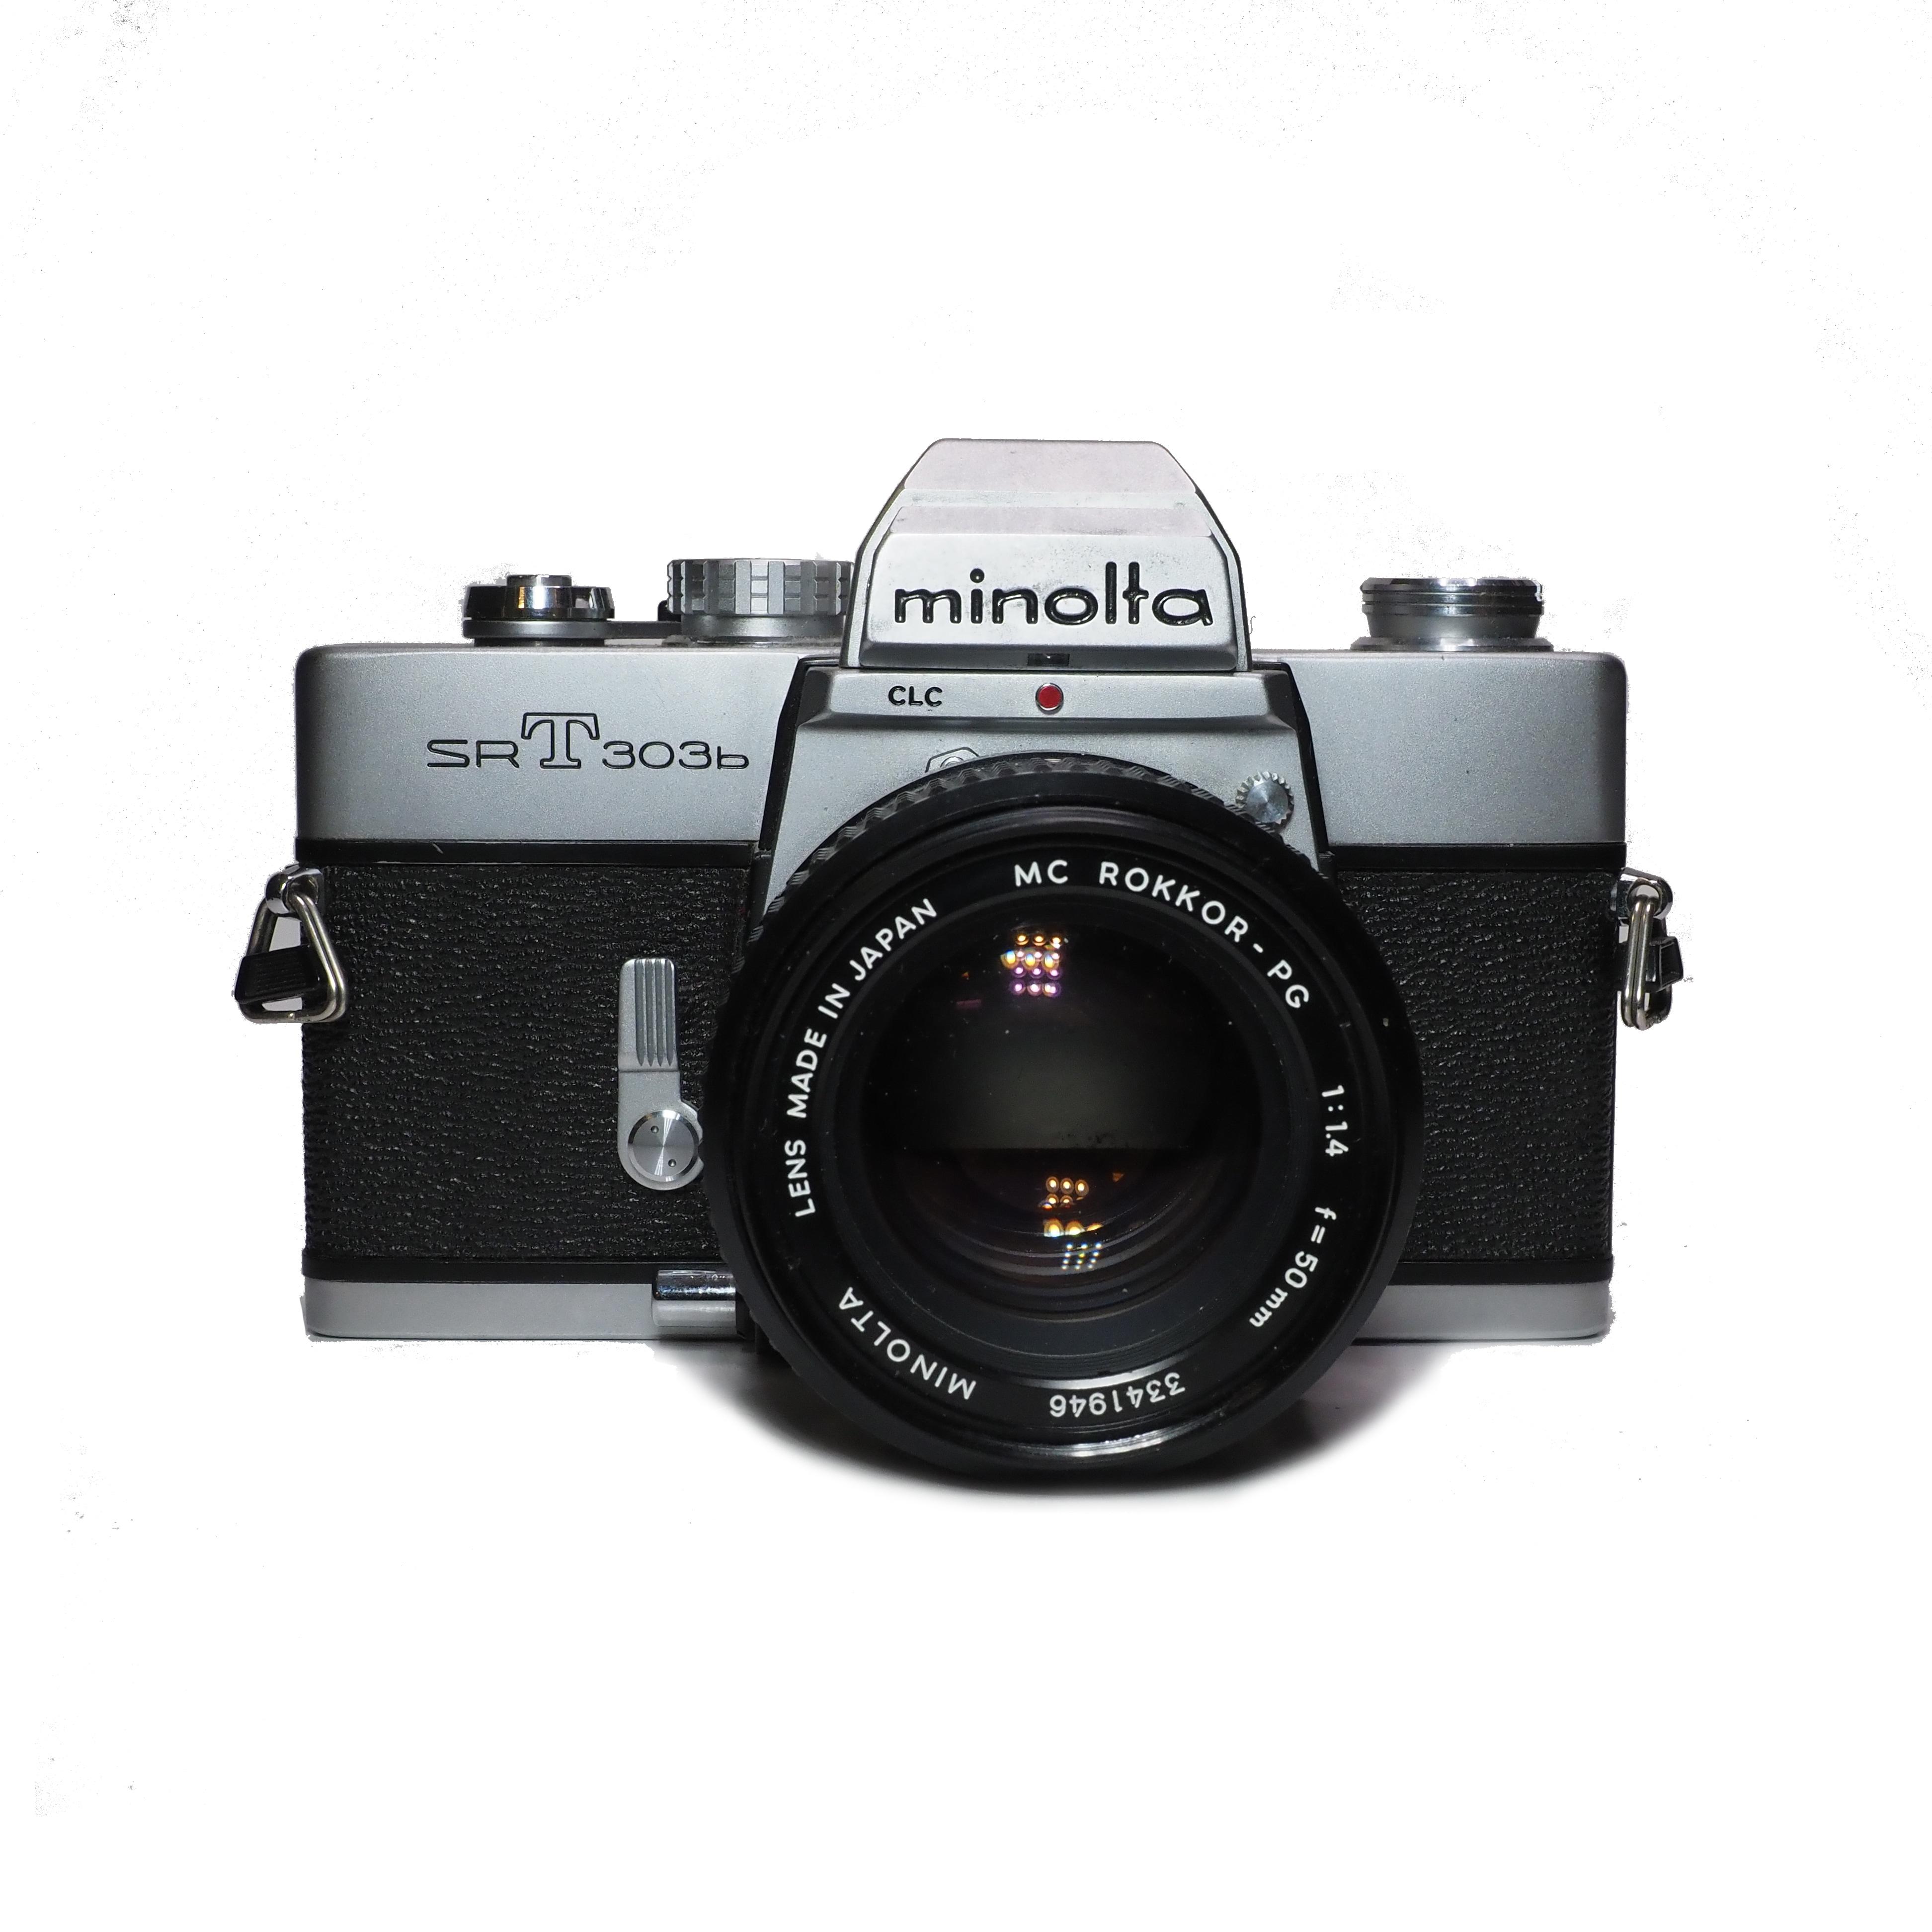 Minolta SRT303b inkl. Minolta MC ROKKOR 50mm f/1,4 - BEGAGNAT